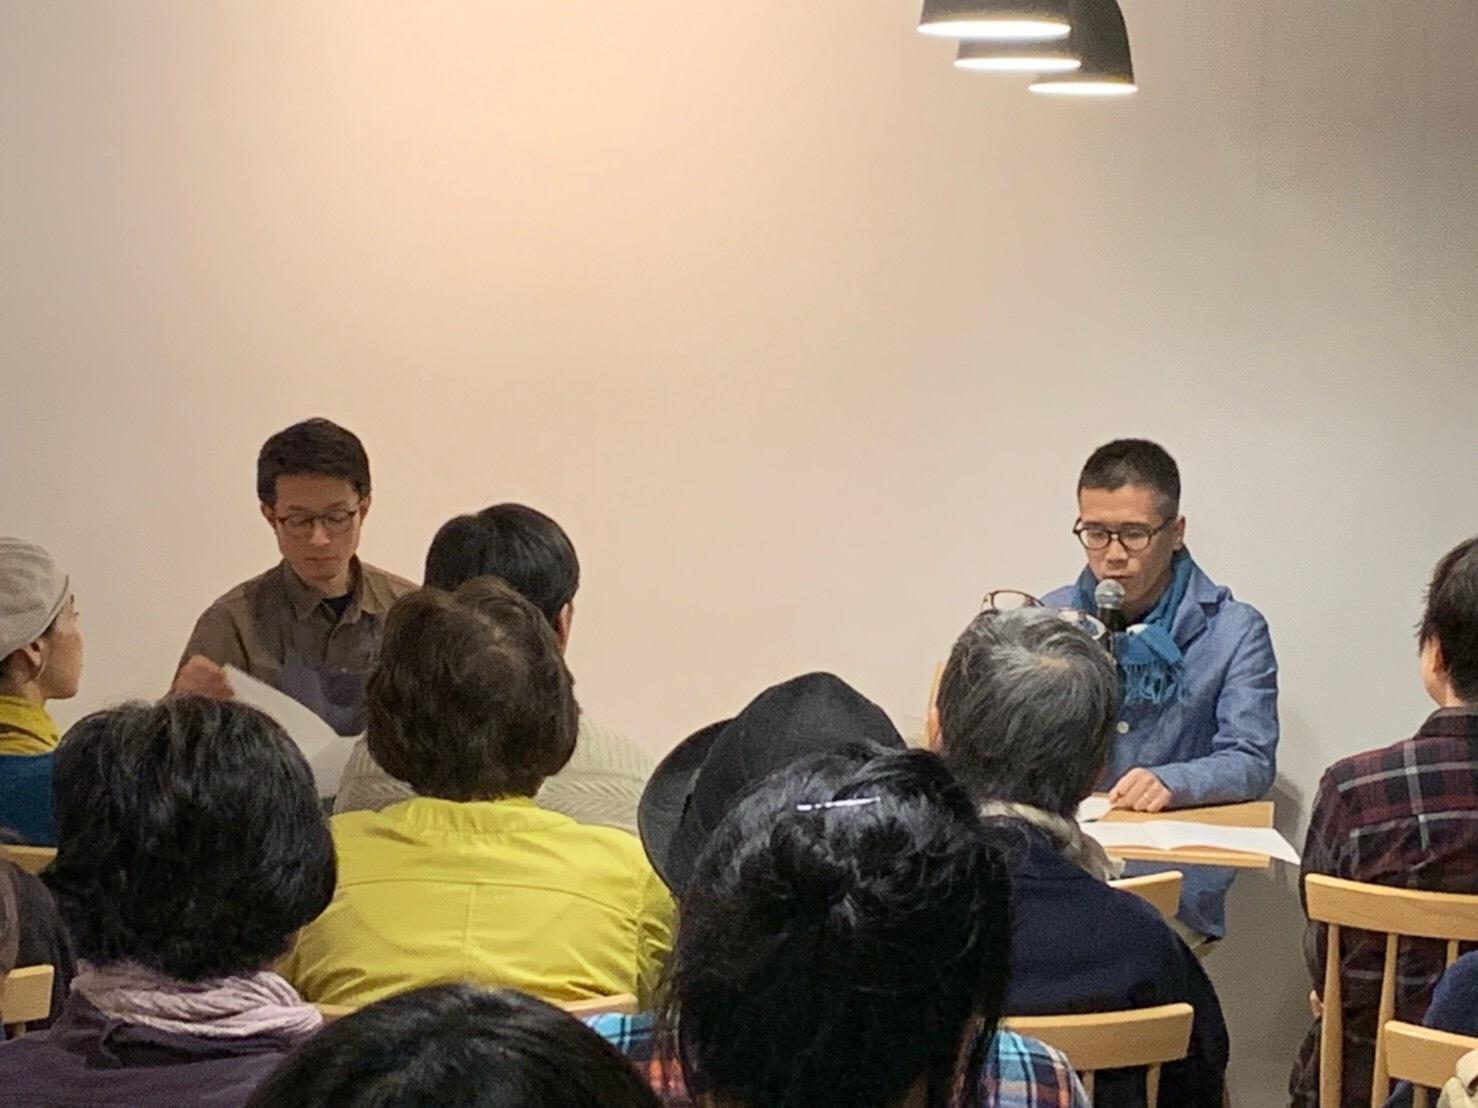 MINOU BOOKS & CAFE にて 「こどもとことば」が開催されました。_d0116009_07595960.jpg